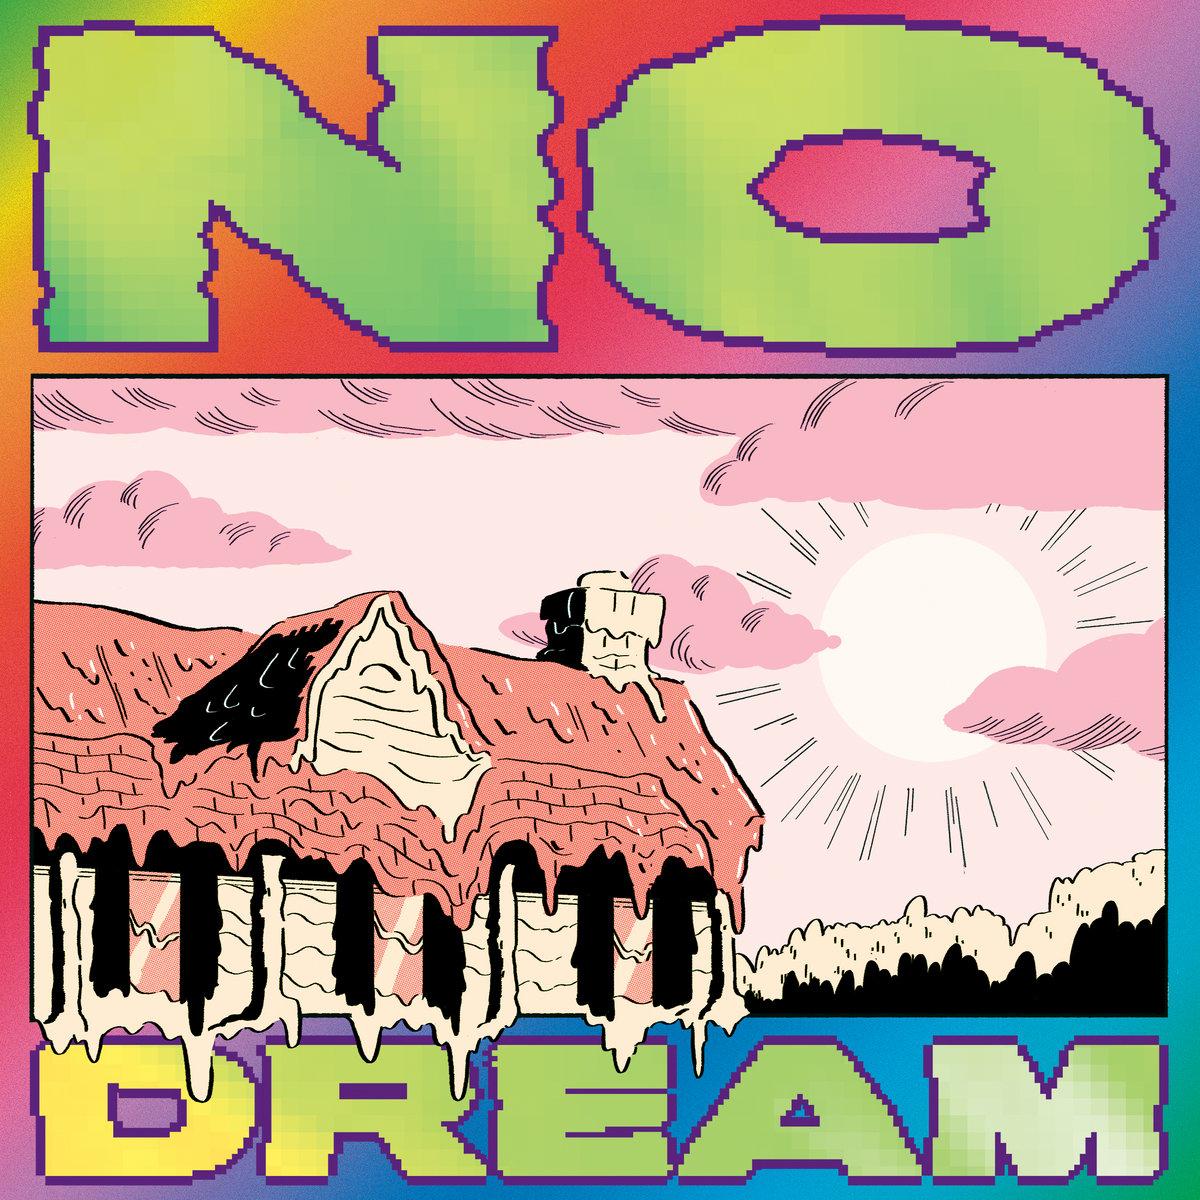 джефф розенсток панк музыка 2020 альбом no dream